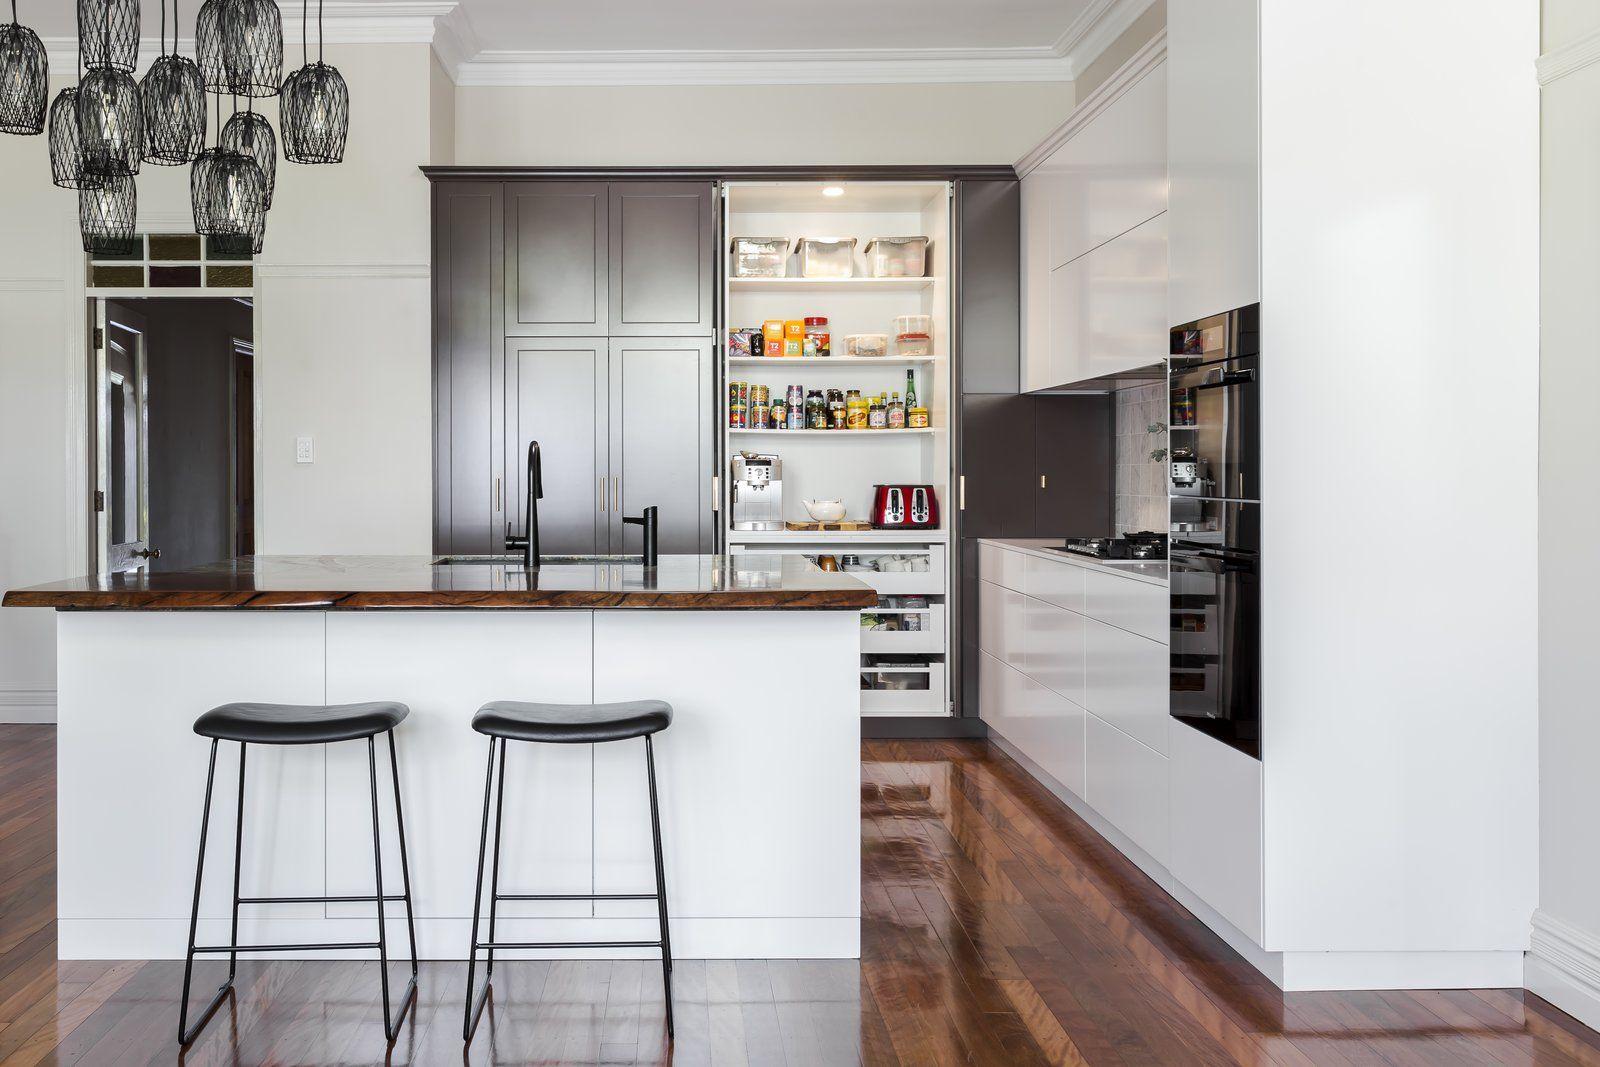 9 Design Tips For Kitchens, According to Expert Renovators ...